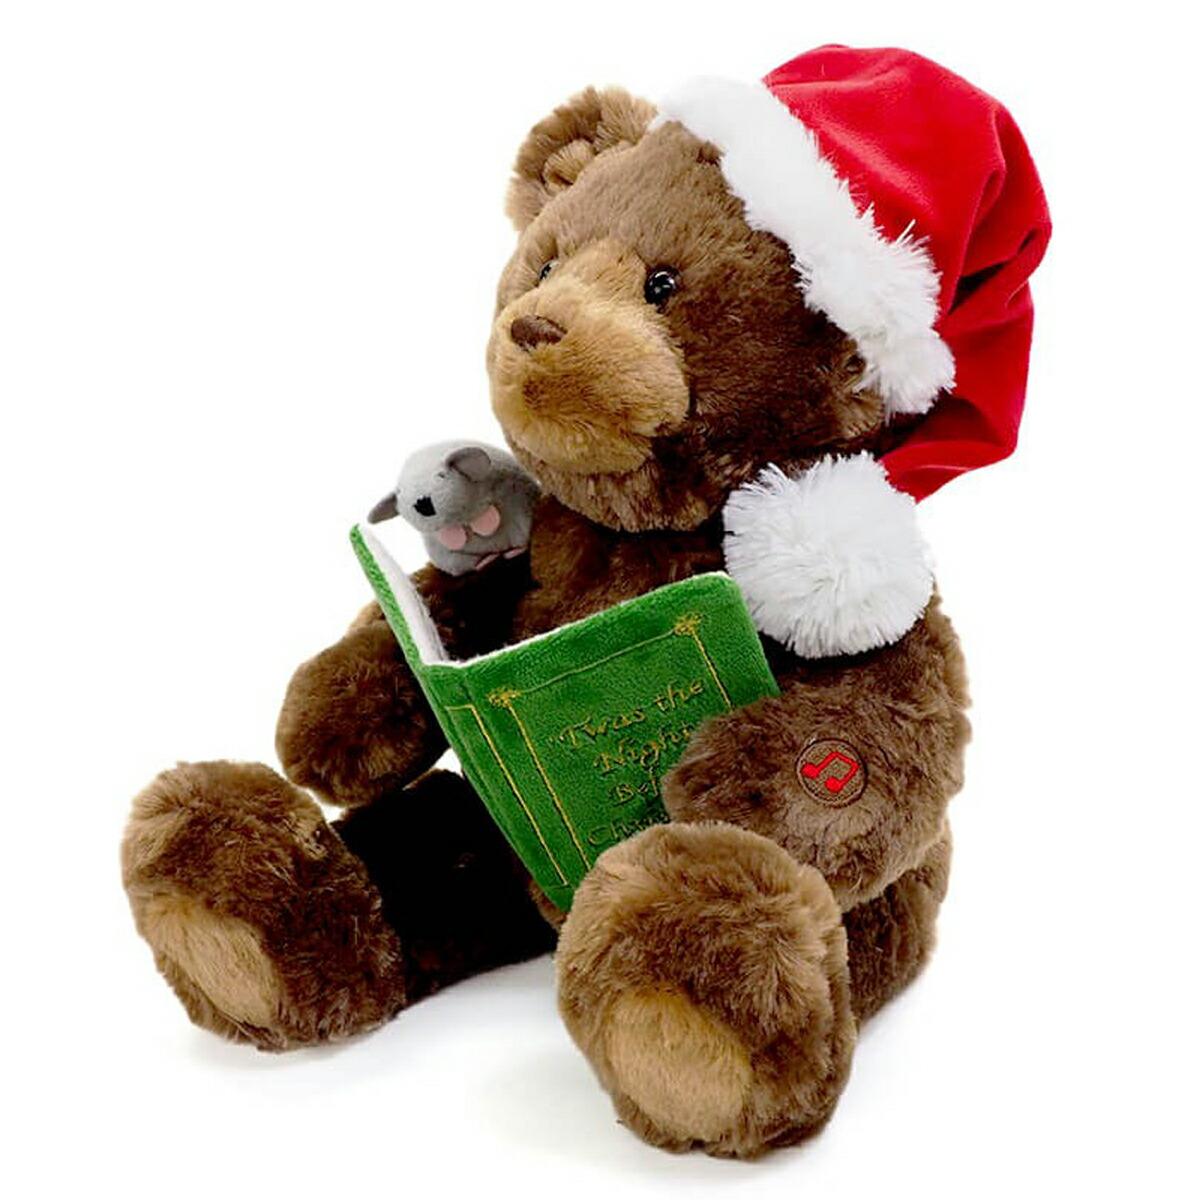 Christmas Holiday kids Gifts Gift Gund My First Teddy Bear Baby Stuffed Animal